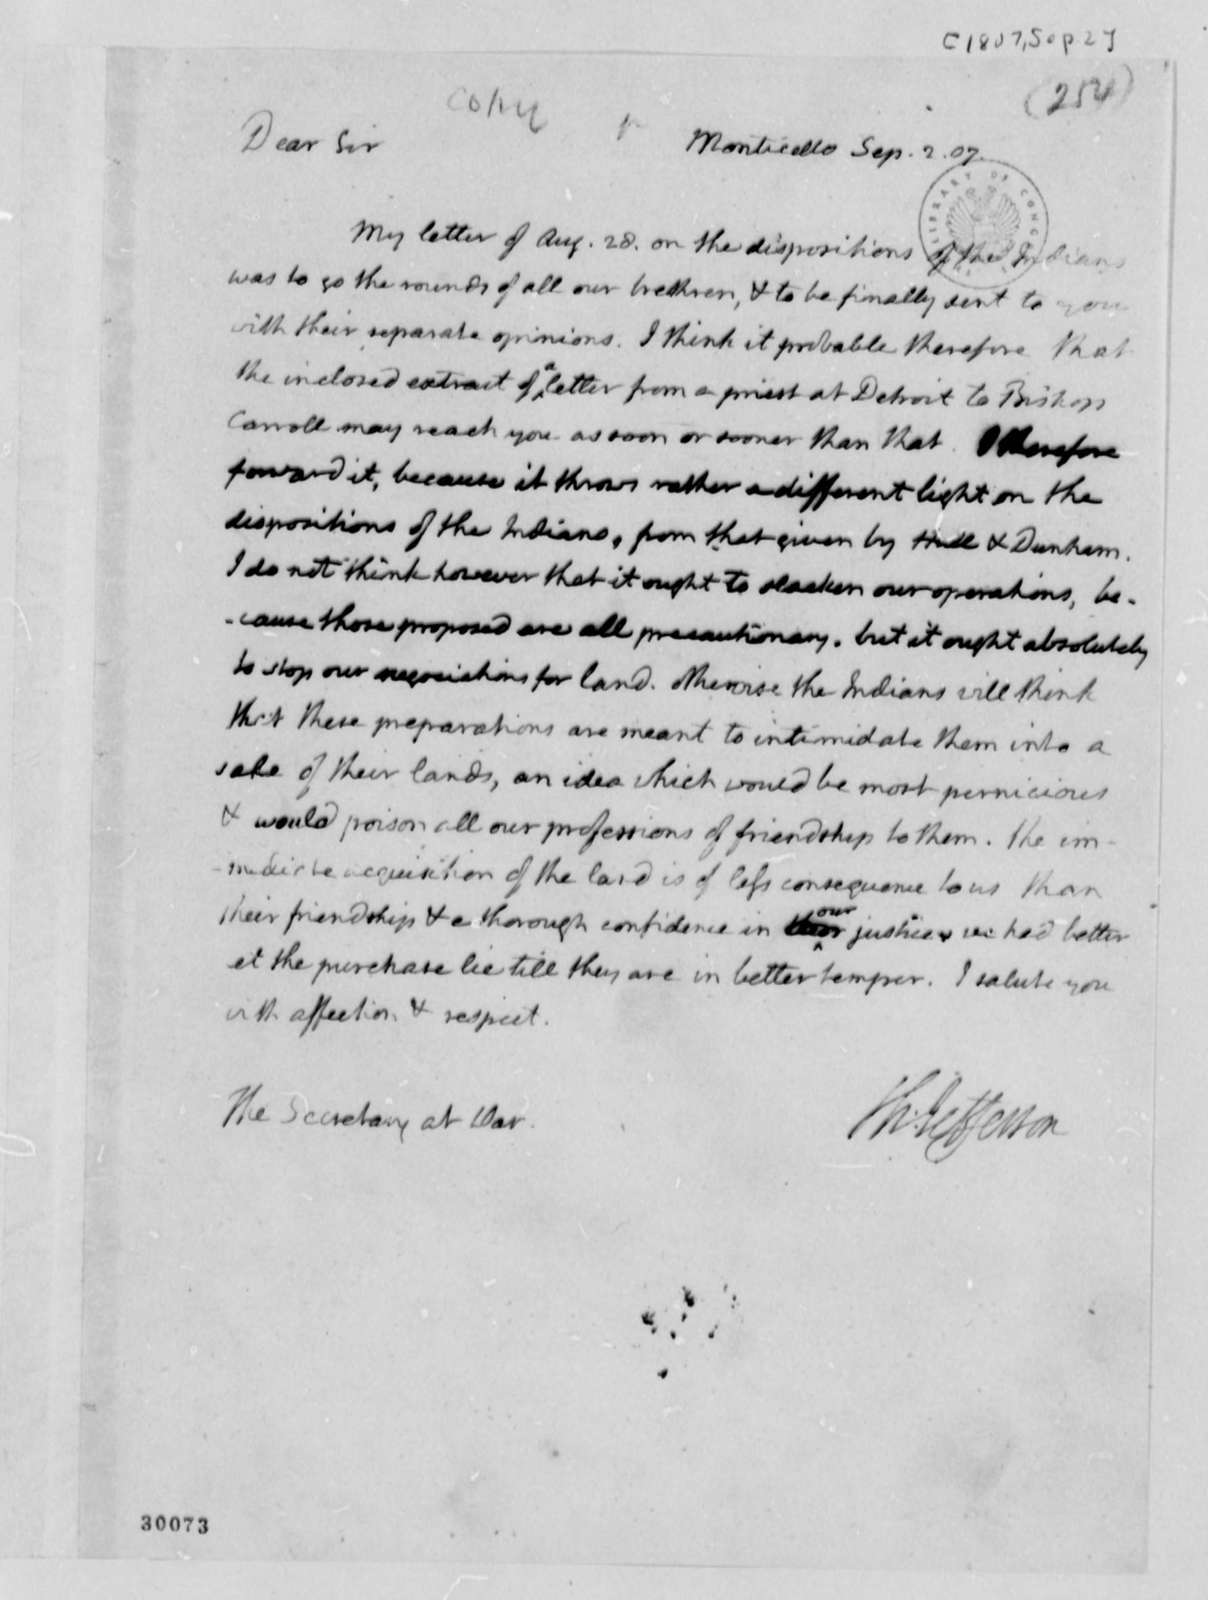 Thomas Jefferson to Henry Dearborn, September 2, 1807